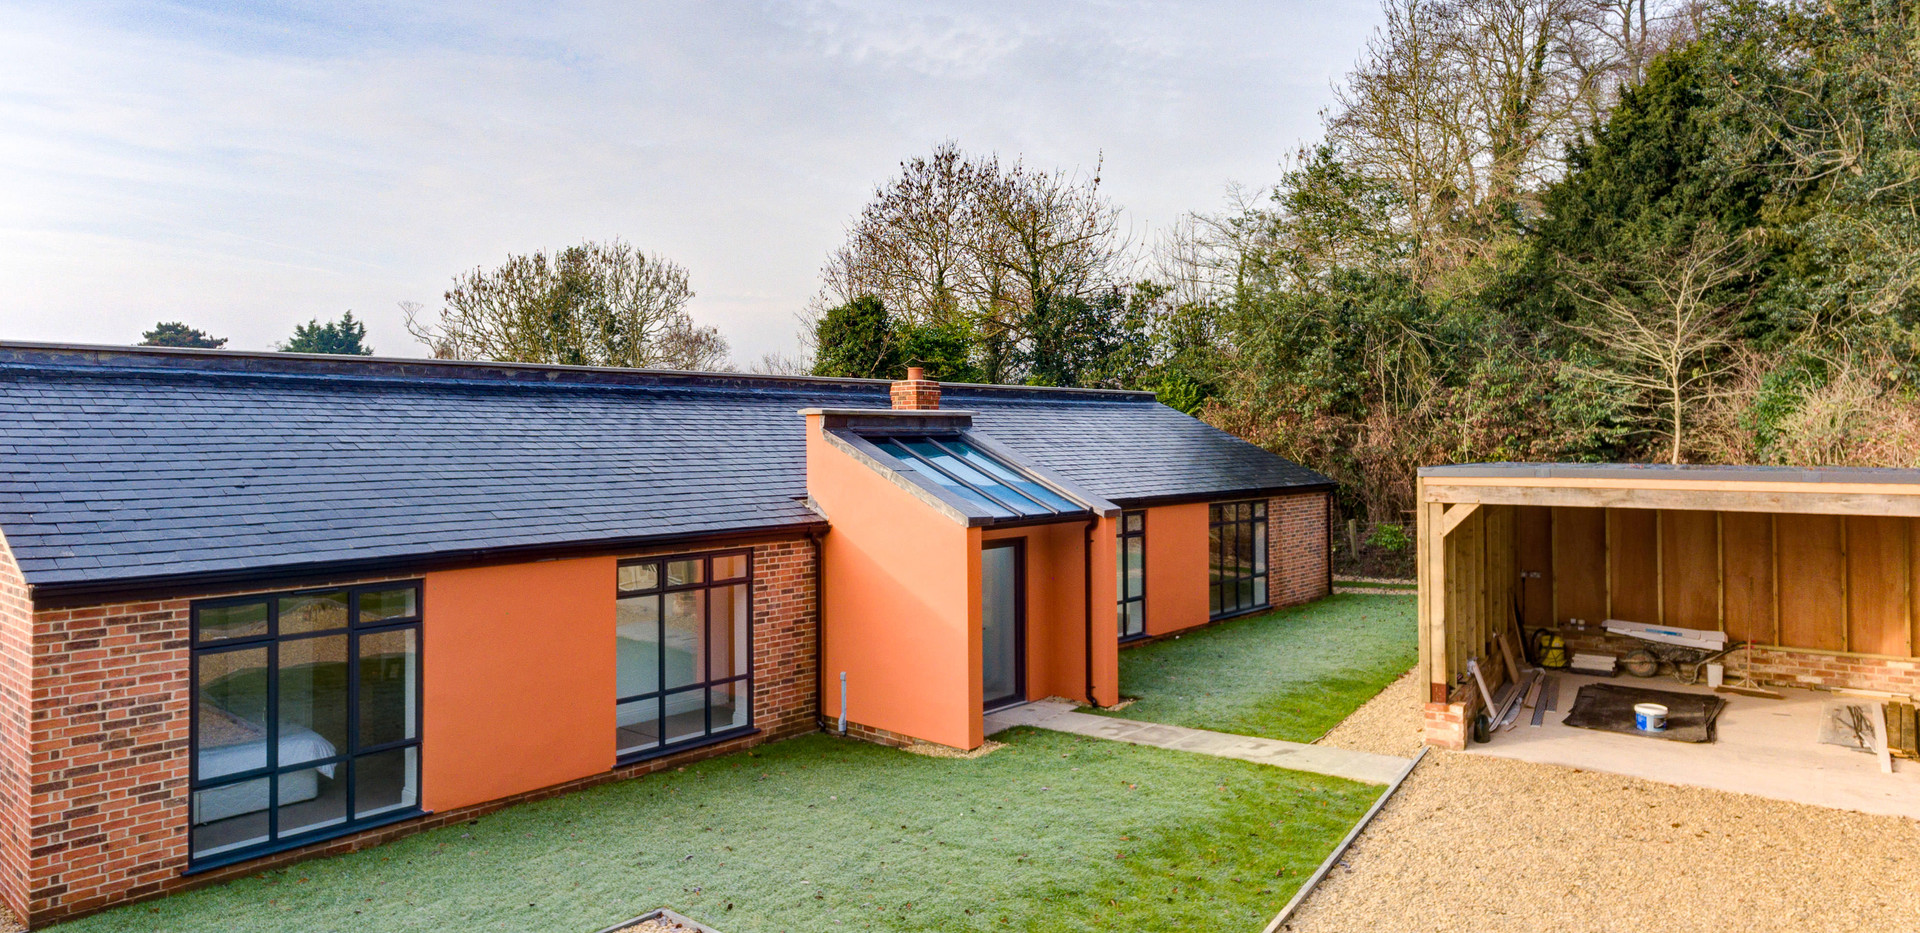 Peach House - The orangery -9.jpg